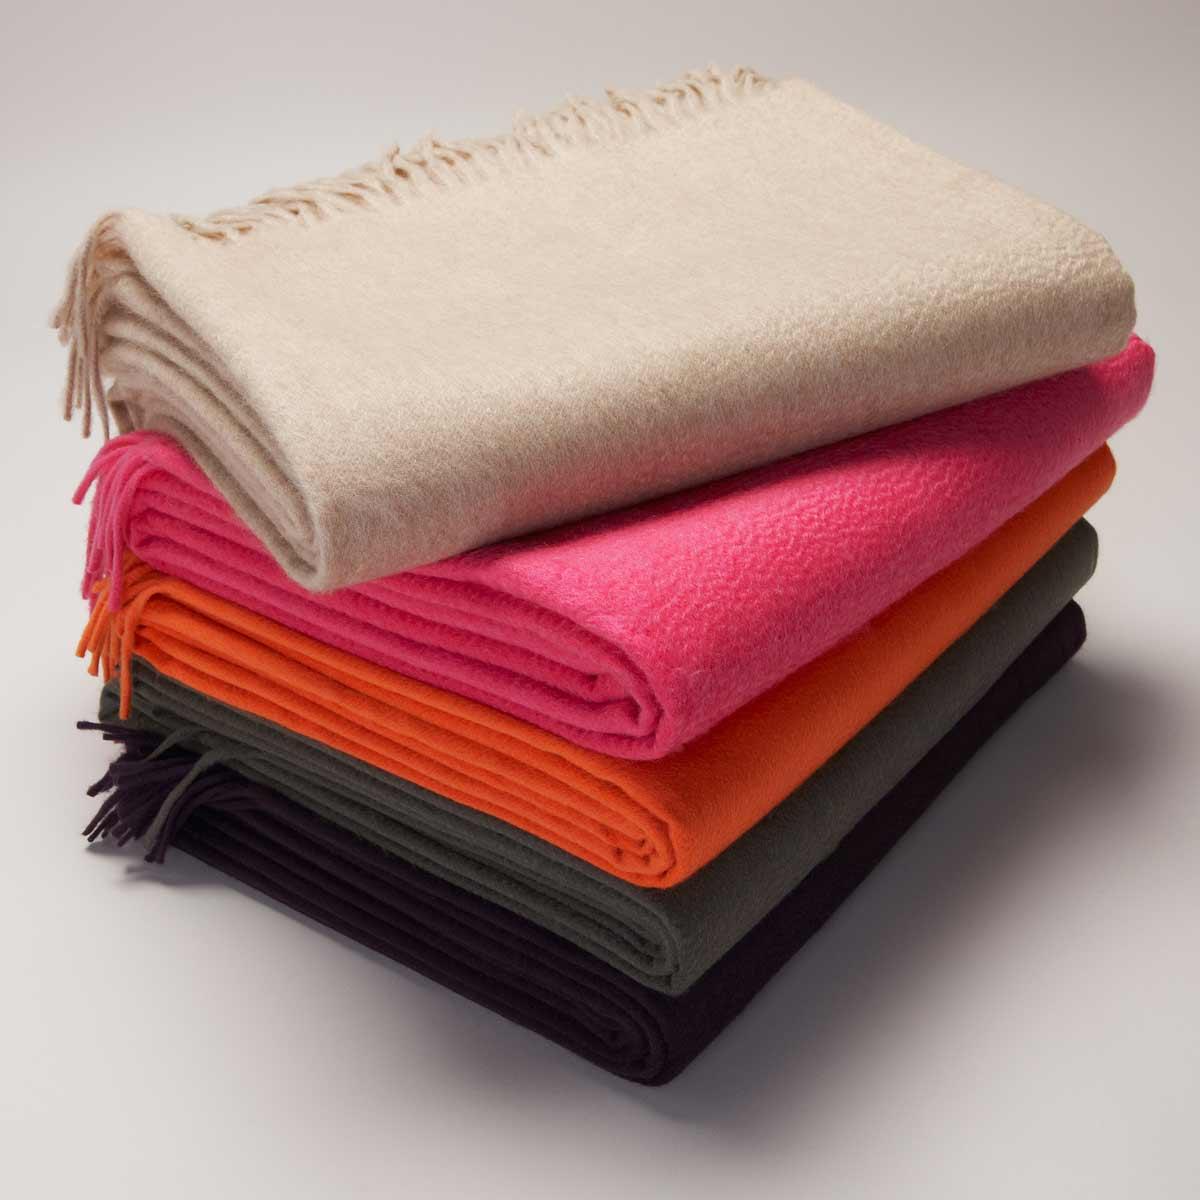 High Quality Woolen Cashmere Blanket